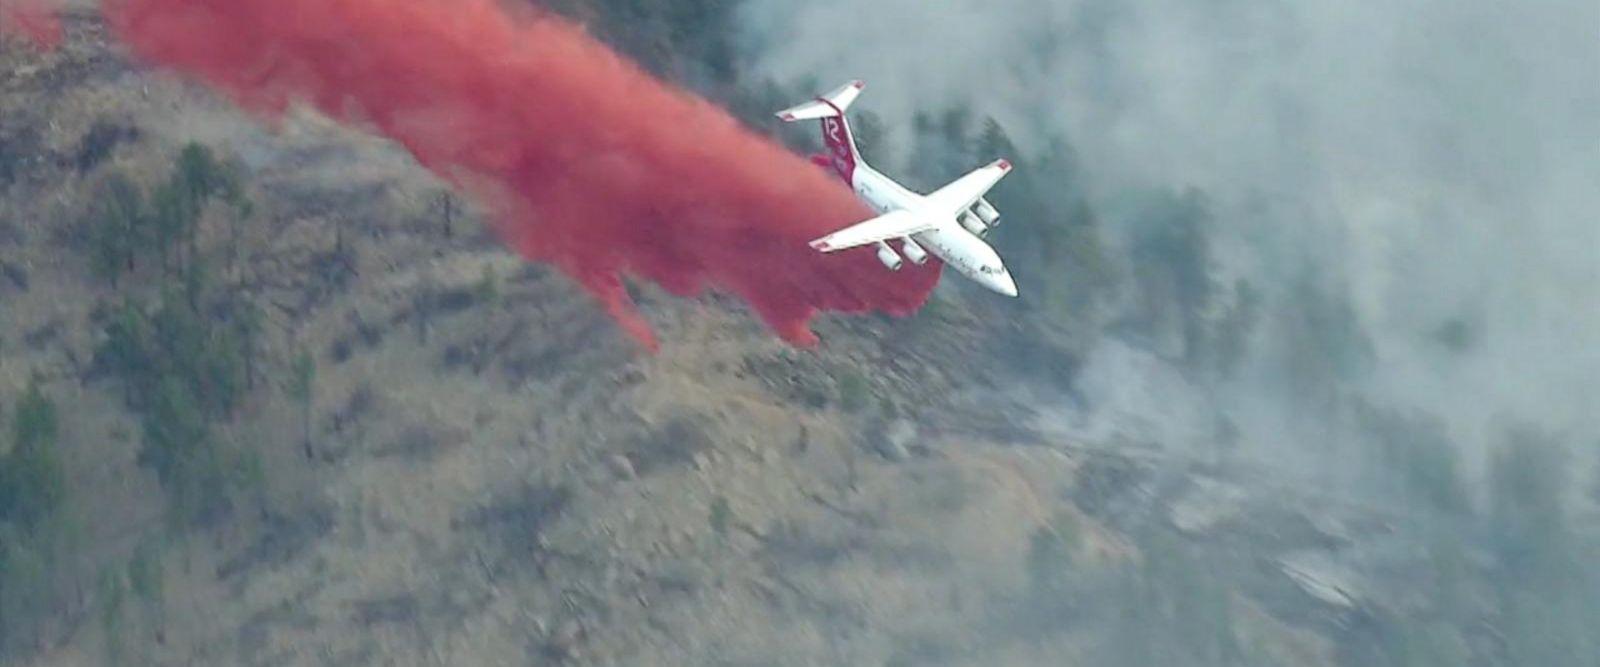 VIDEO: Colorado wildfire forces hundreds of evacuations